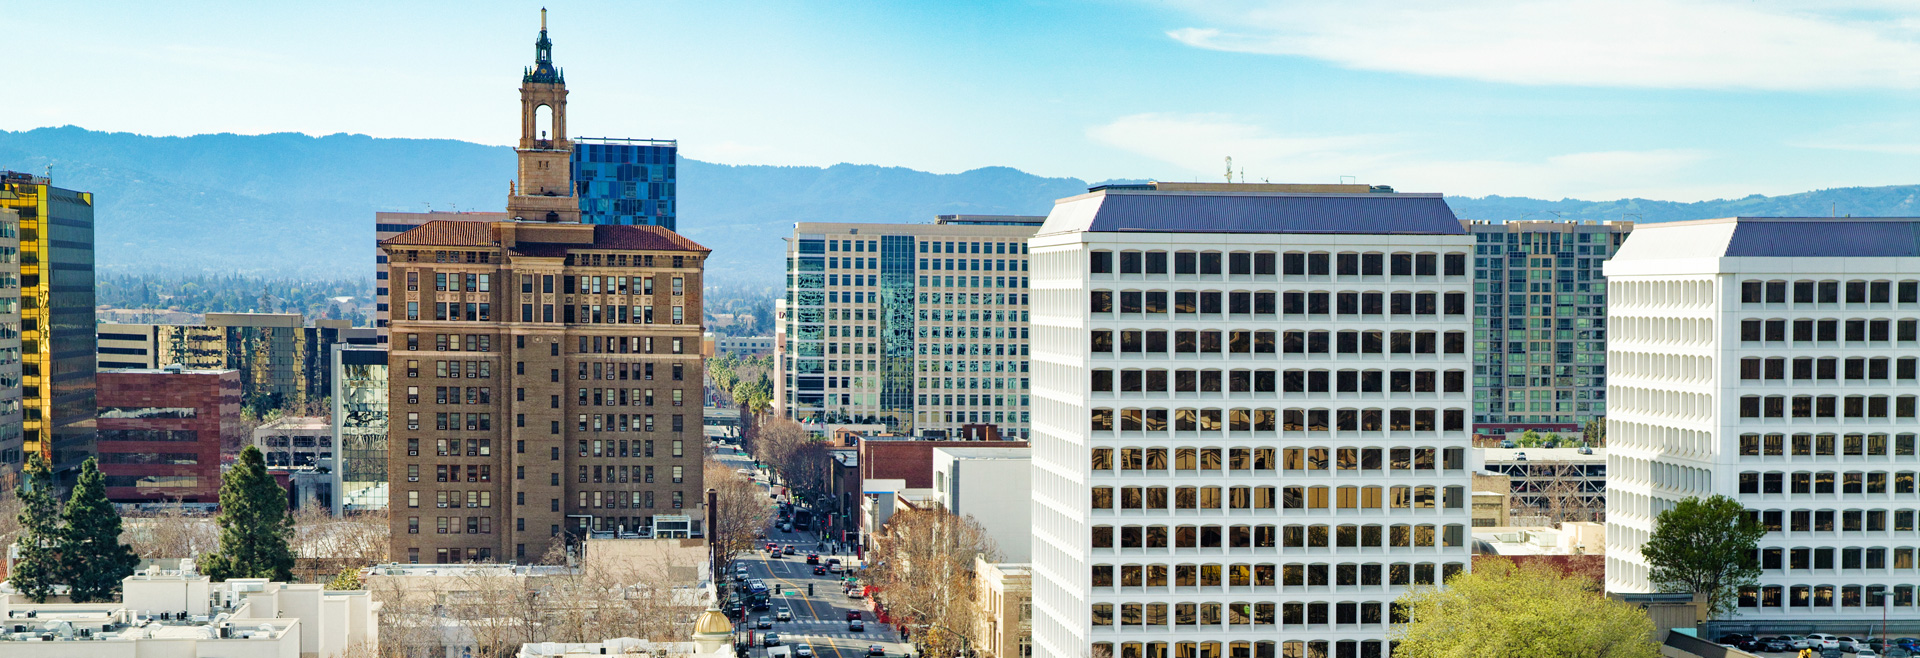 Location of Driftwood Inn Hotel Santa Clara, California